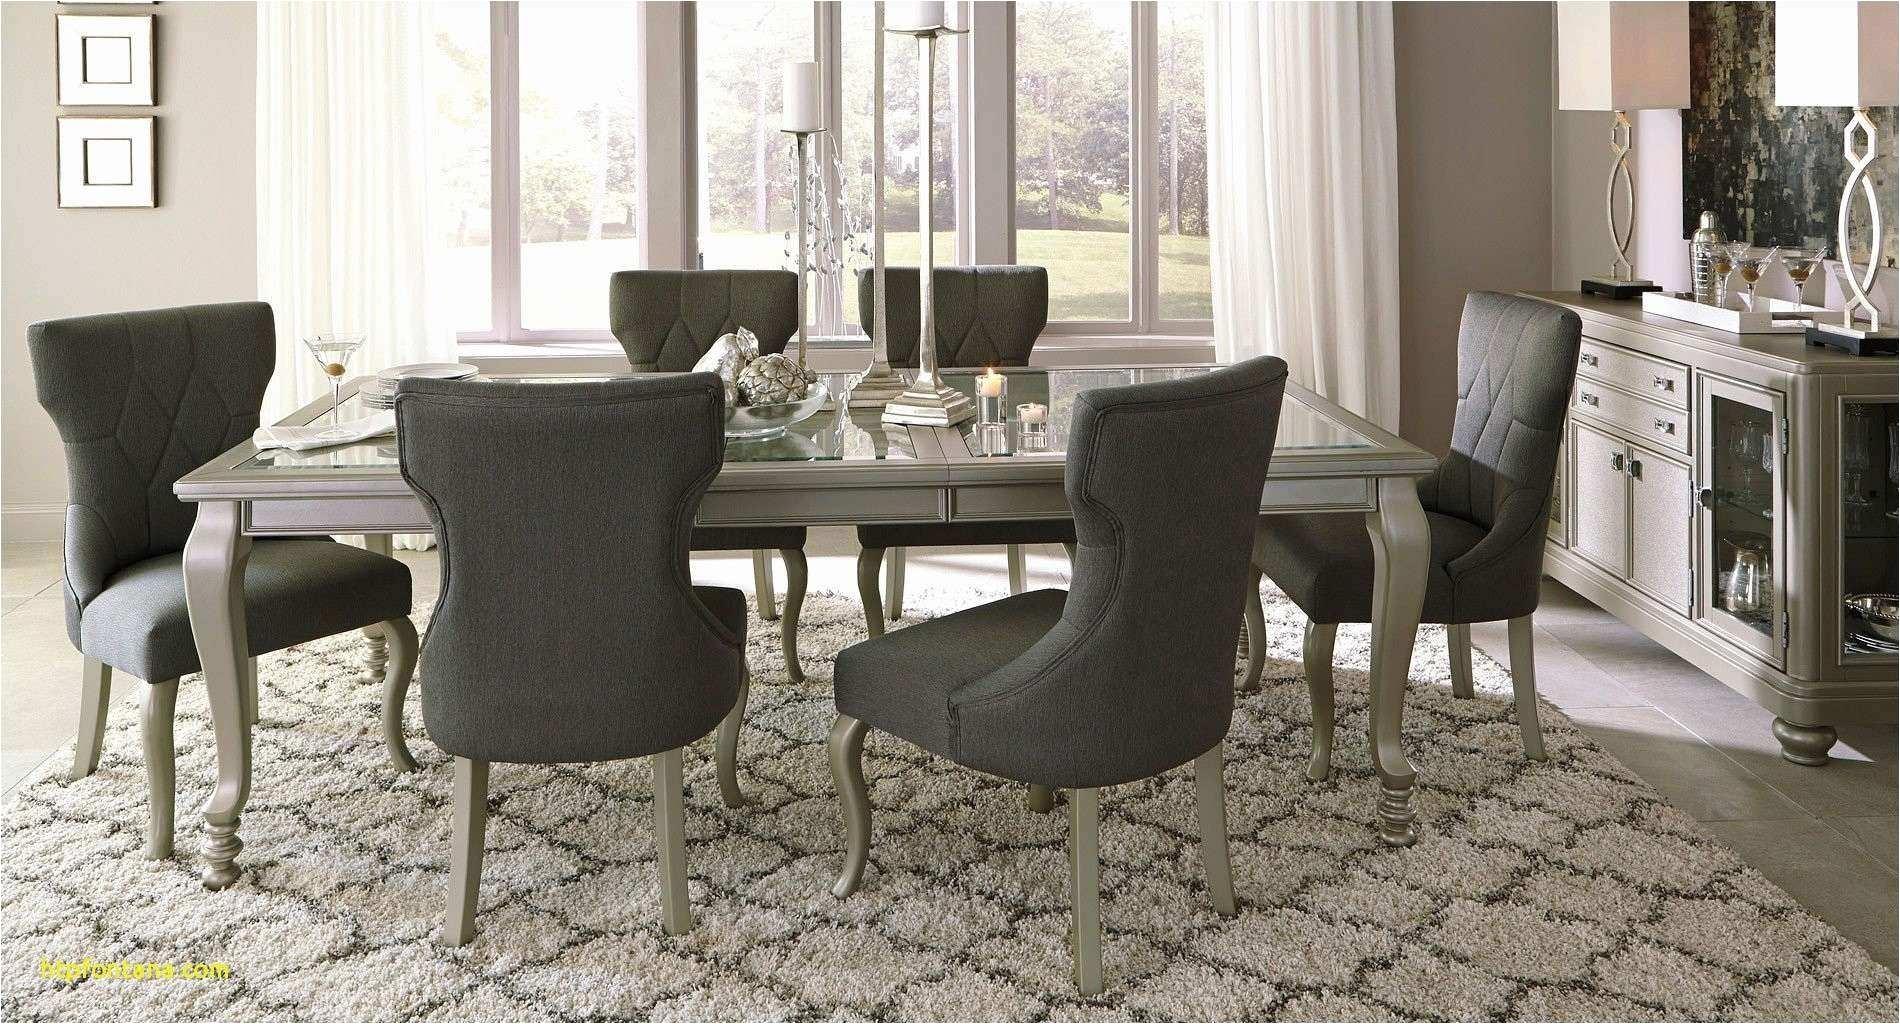 garden store near me lovely modern living room designs 2018 luxury shaker chairs 0d archives